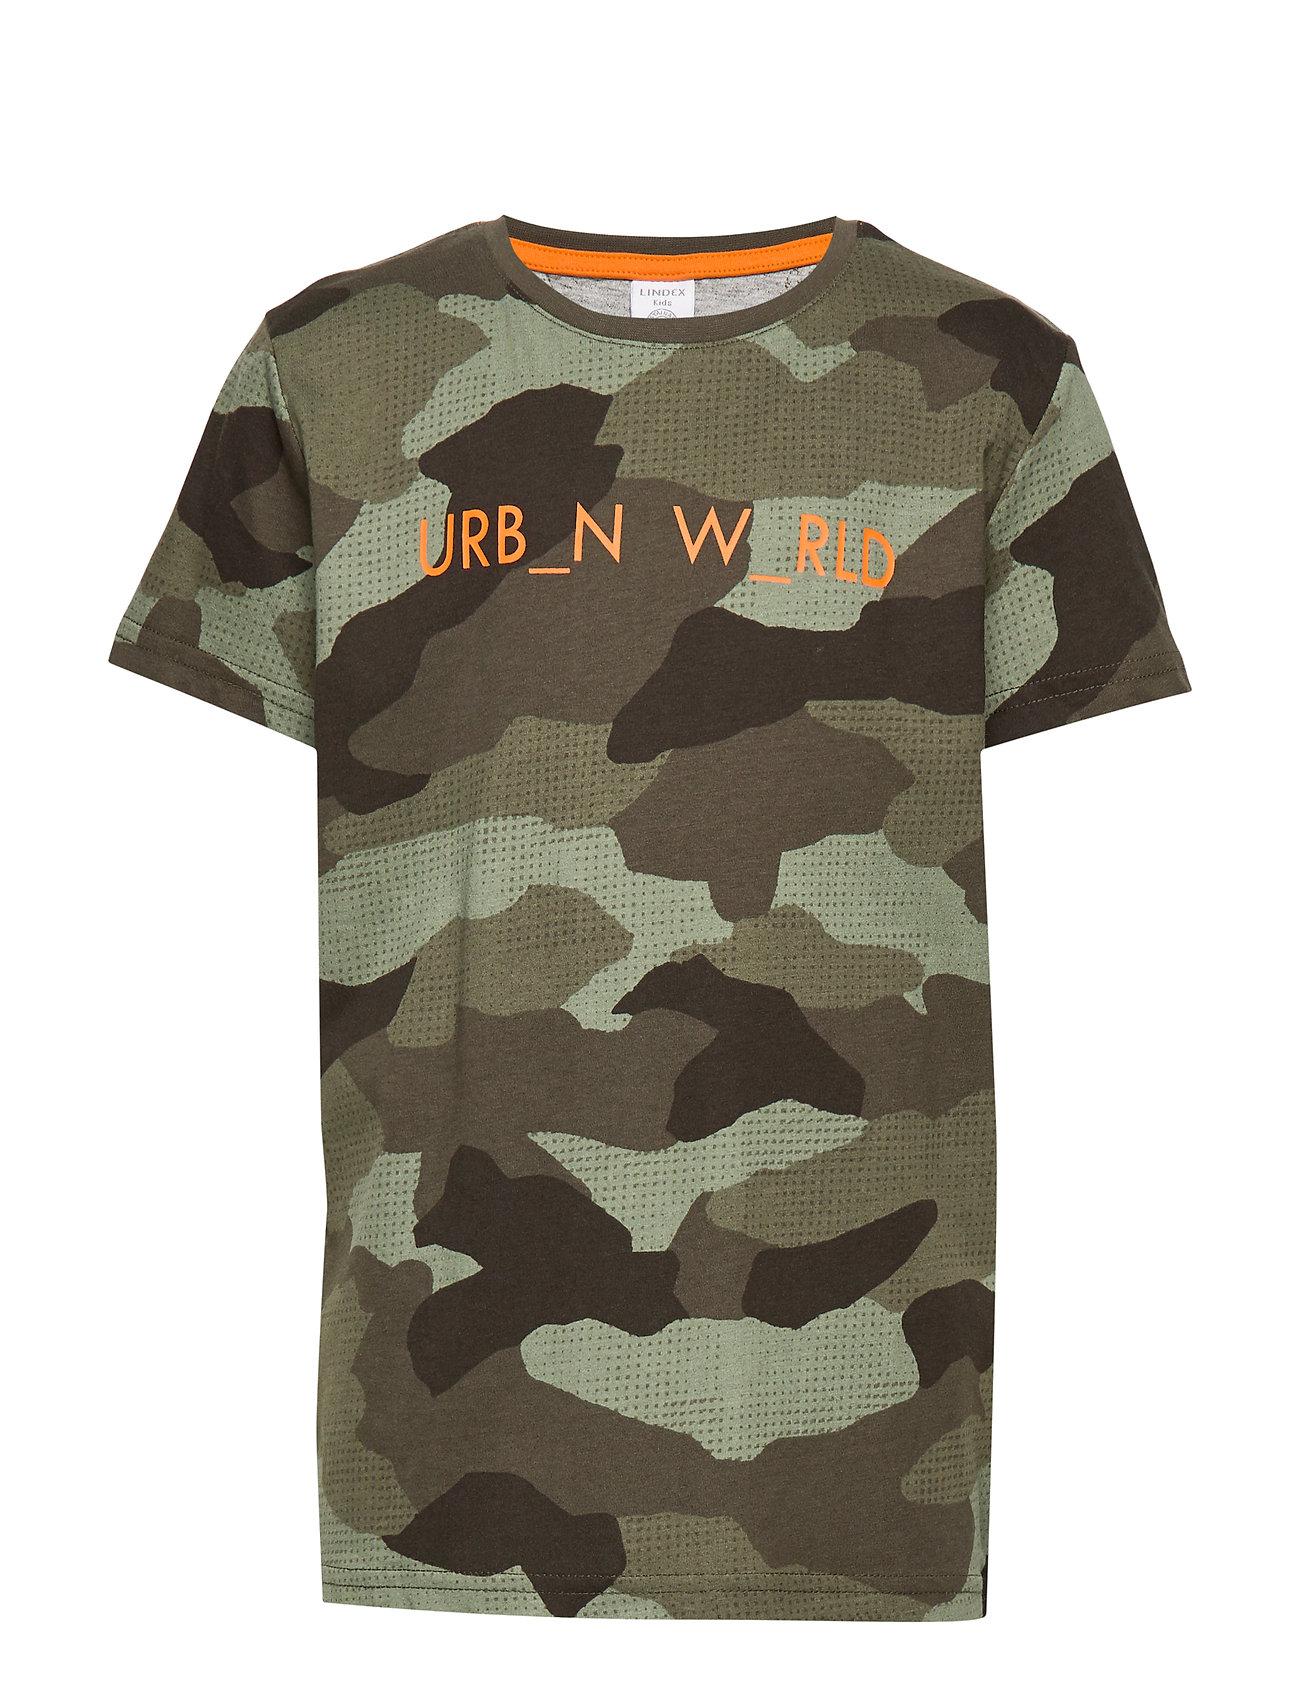 Lindex T shirt street aop urbn wrld - DK KHAKI GREEN